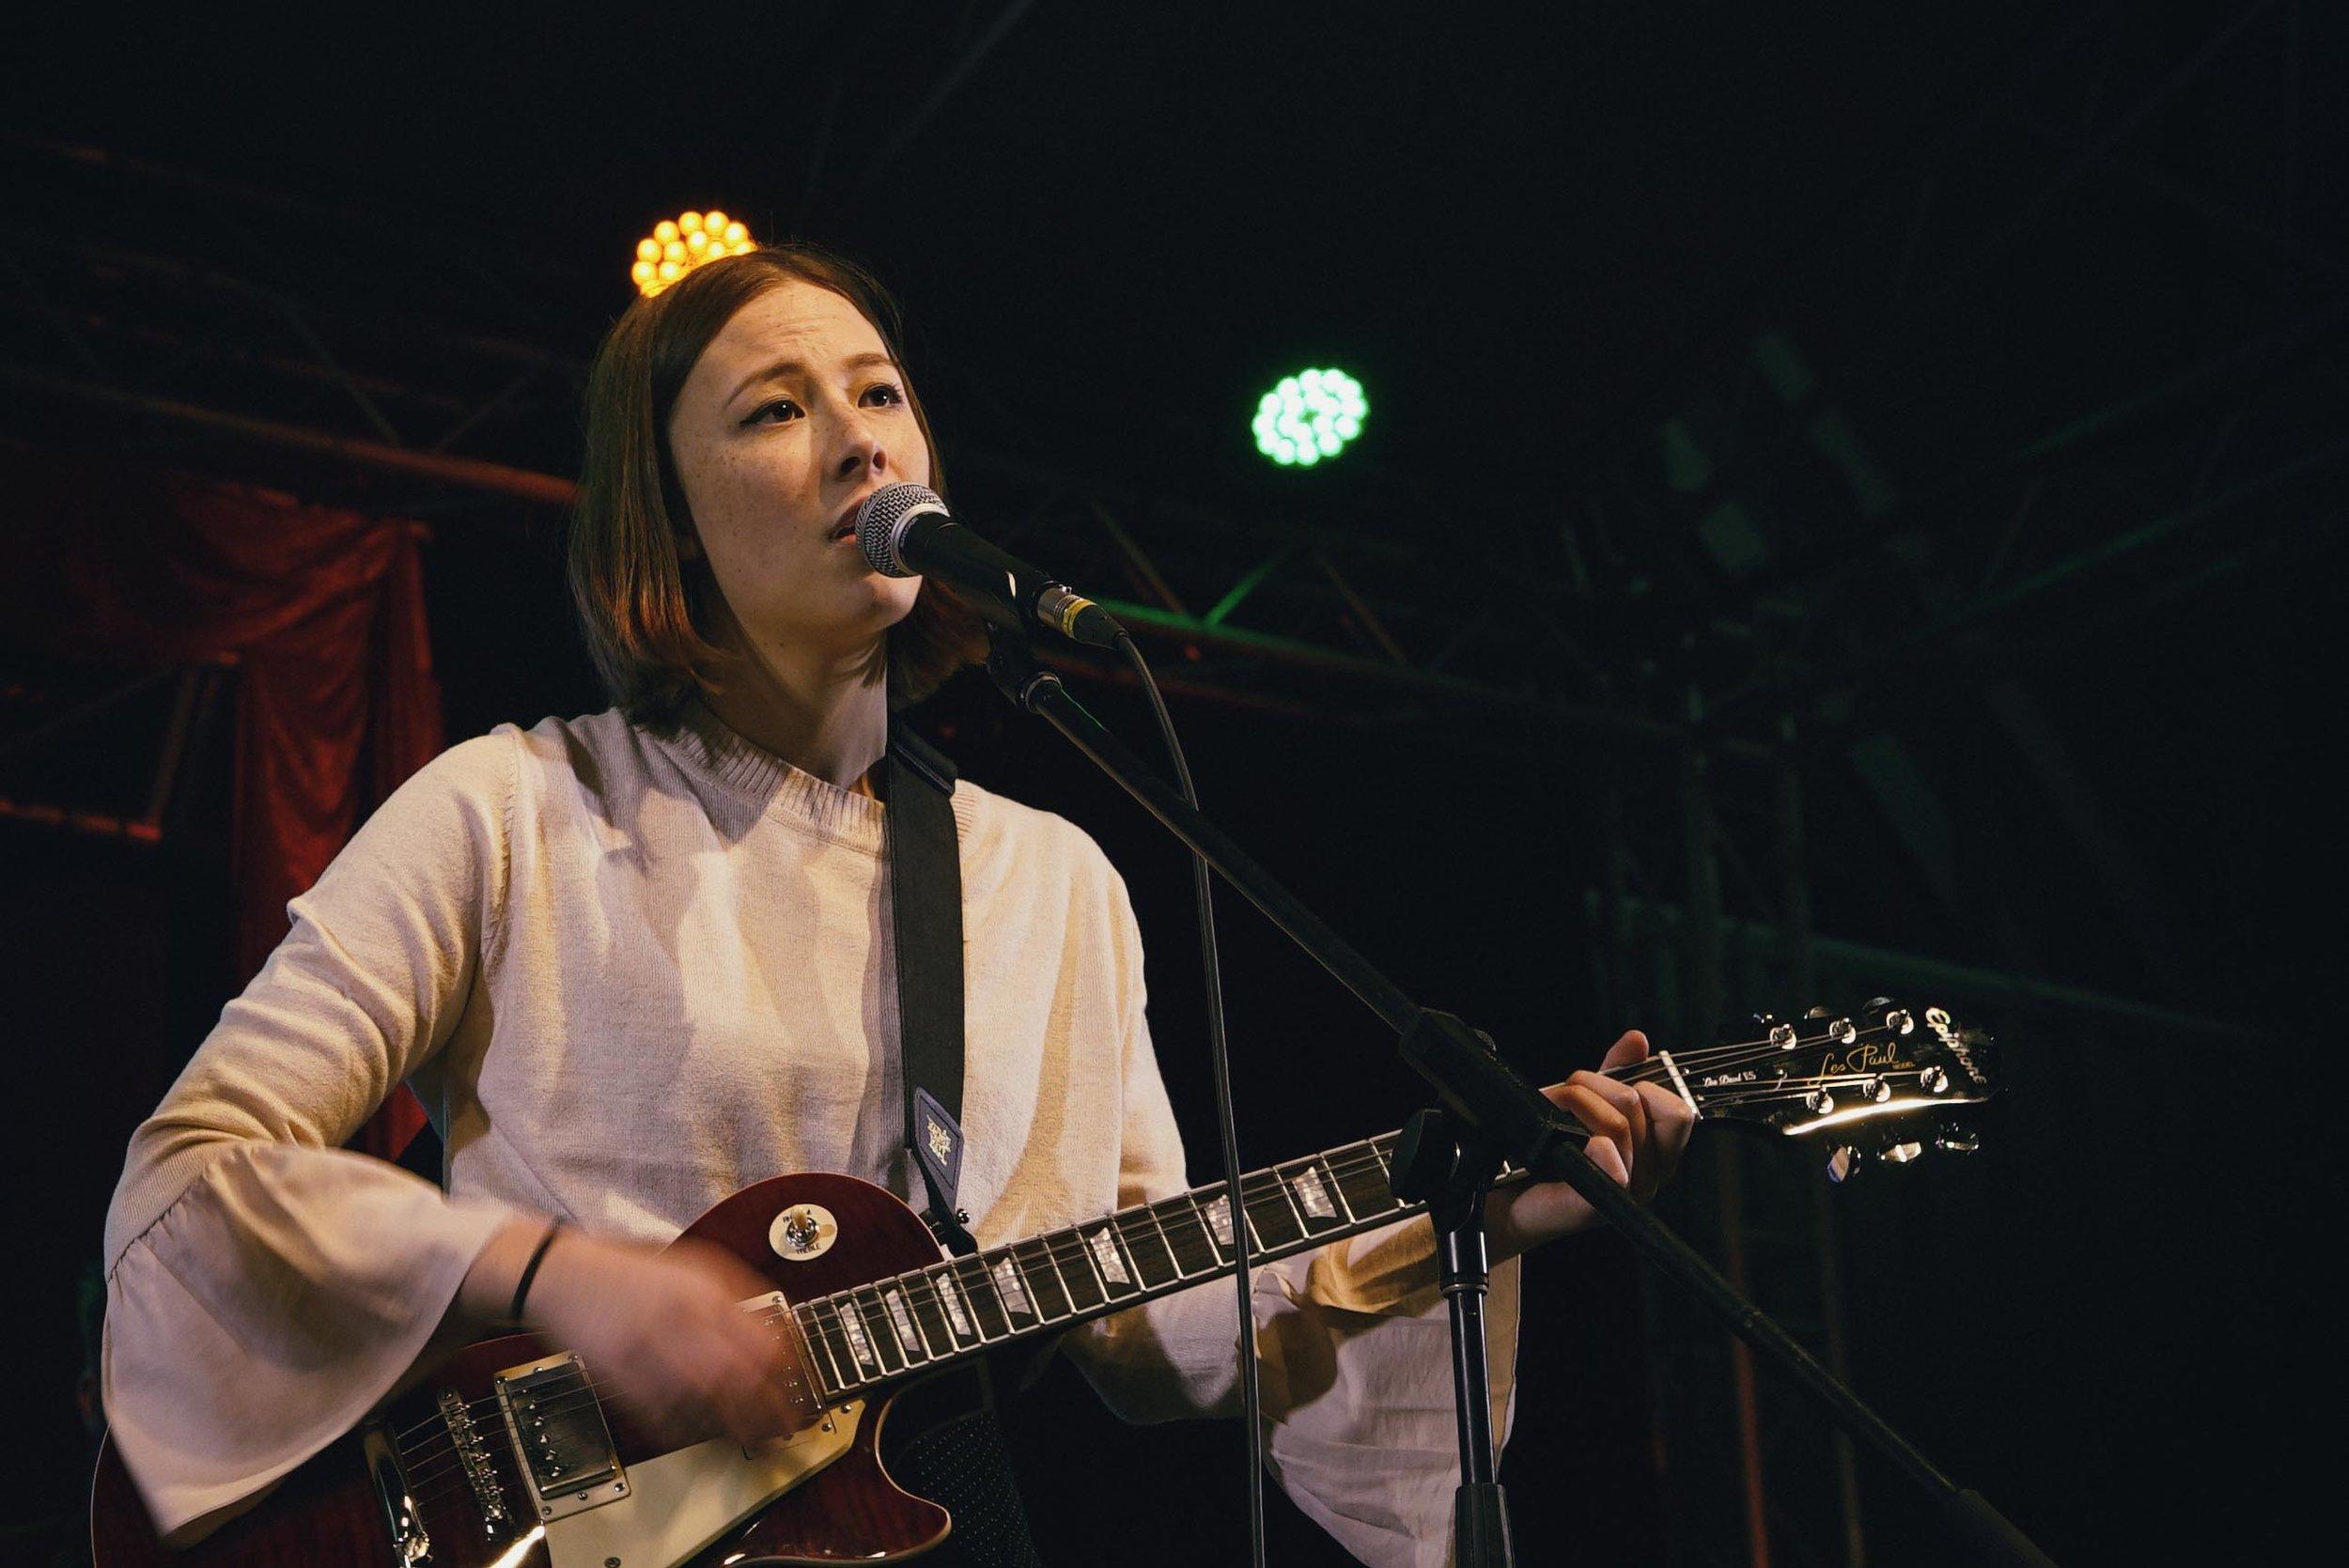 Hazel Mei at NightQuarter 2018